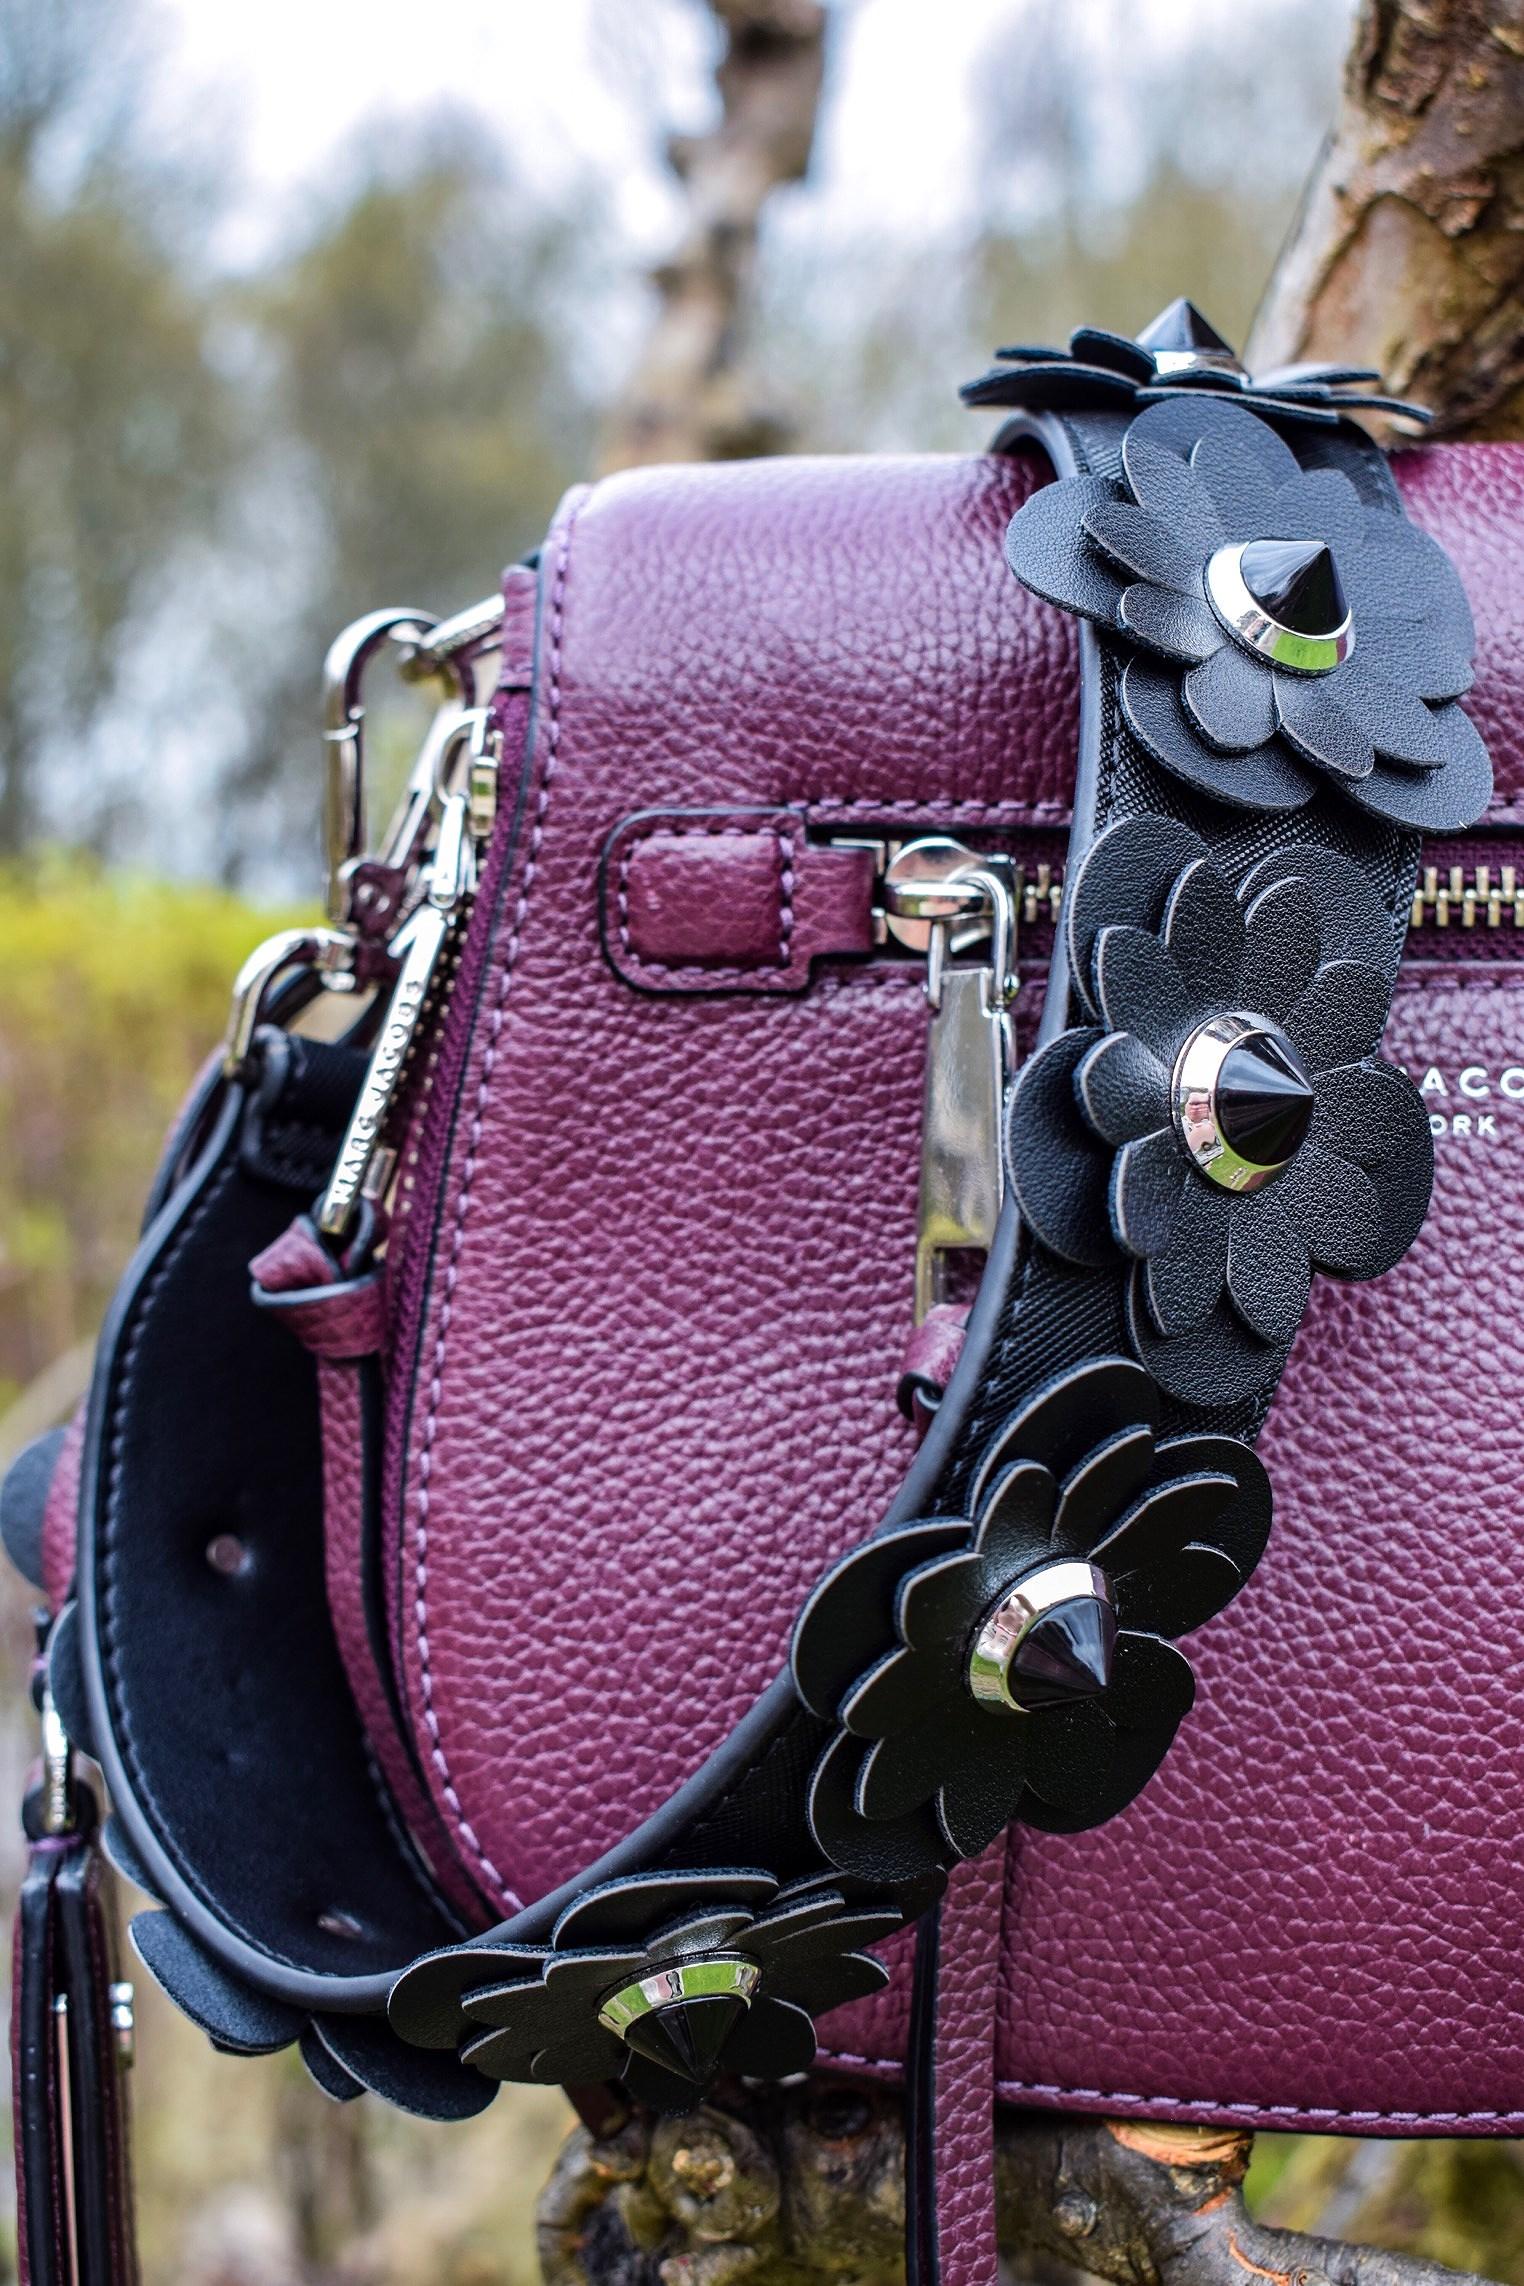 Flower bag strap